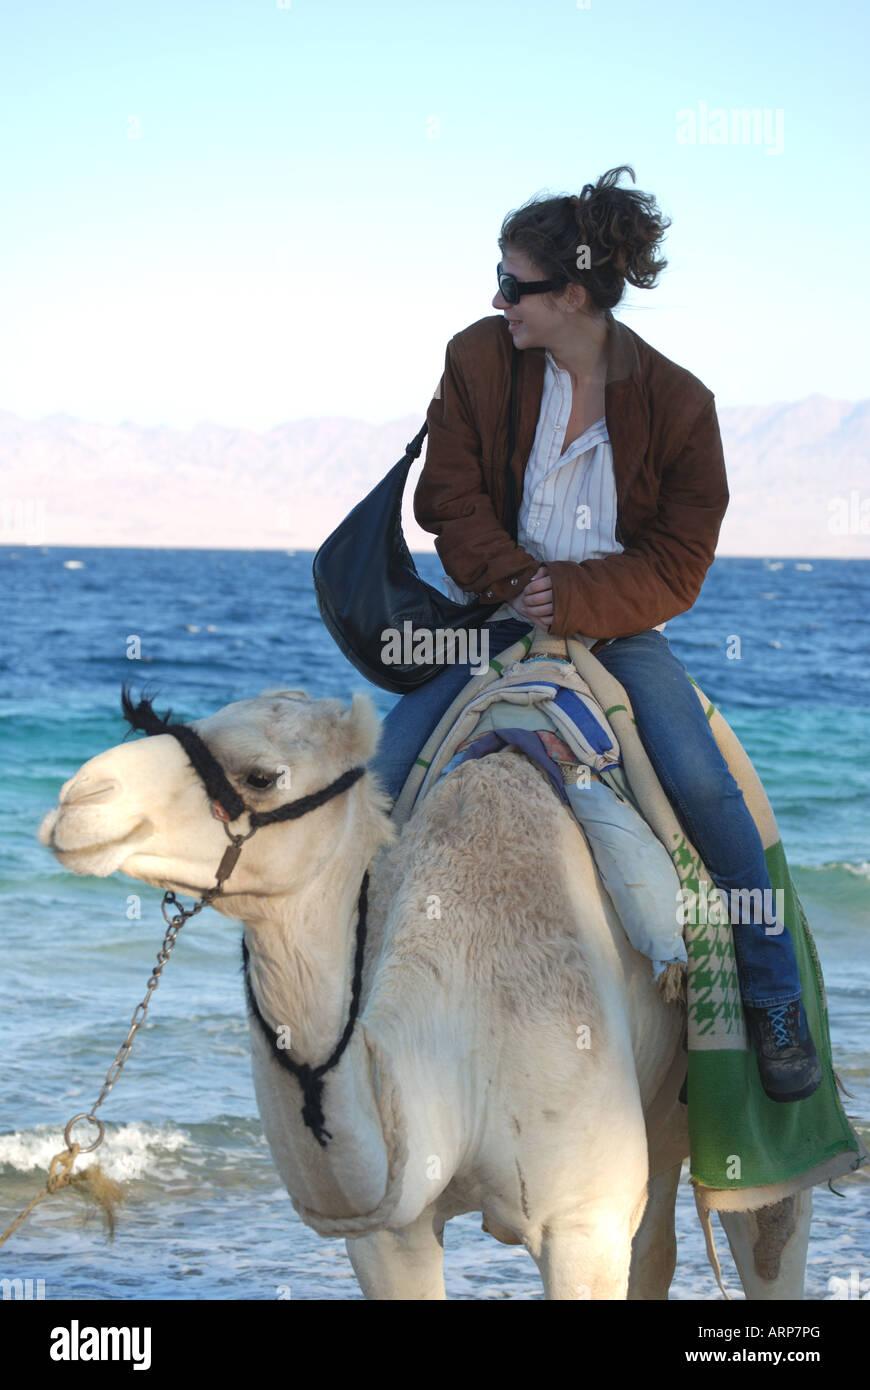 Young woman riding camel on beach, Nuweiba, Sinai Peninsula, Republic of Egypt - Stock Image